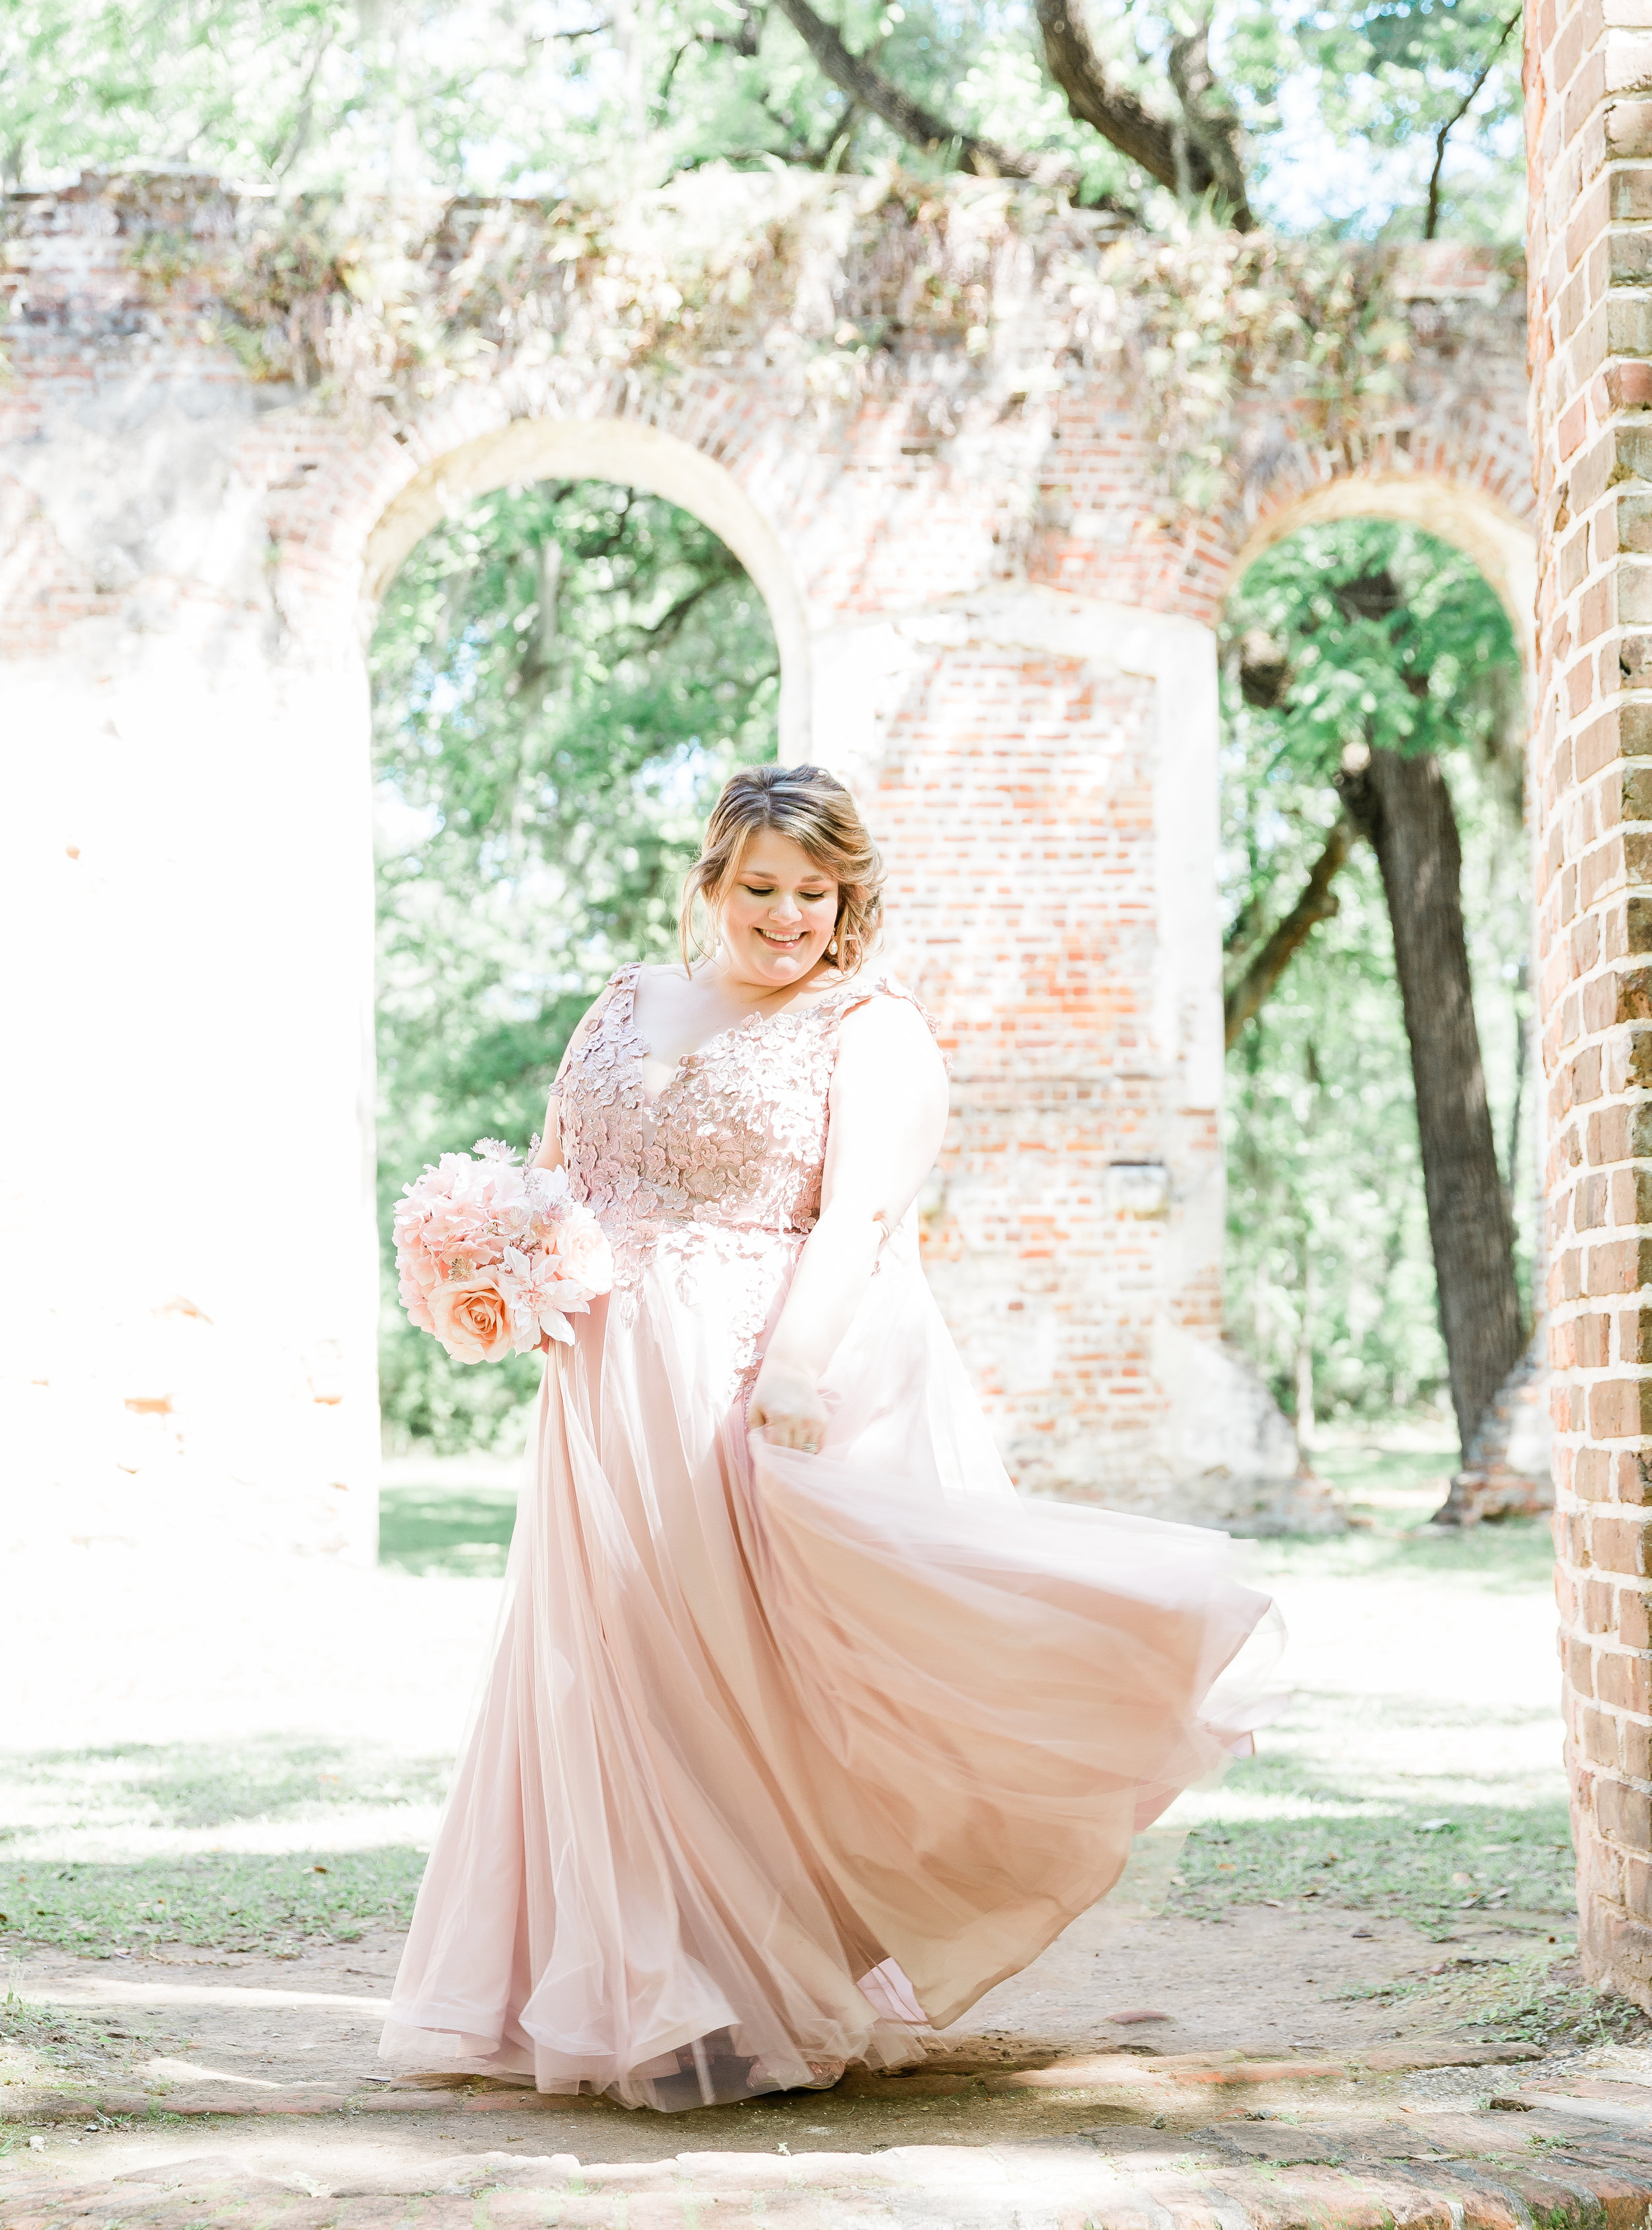 20190417-Southern Lens Photography-savannah family photographer- Ashley and Zack-old sheldon church ruins-201938.jpg